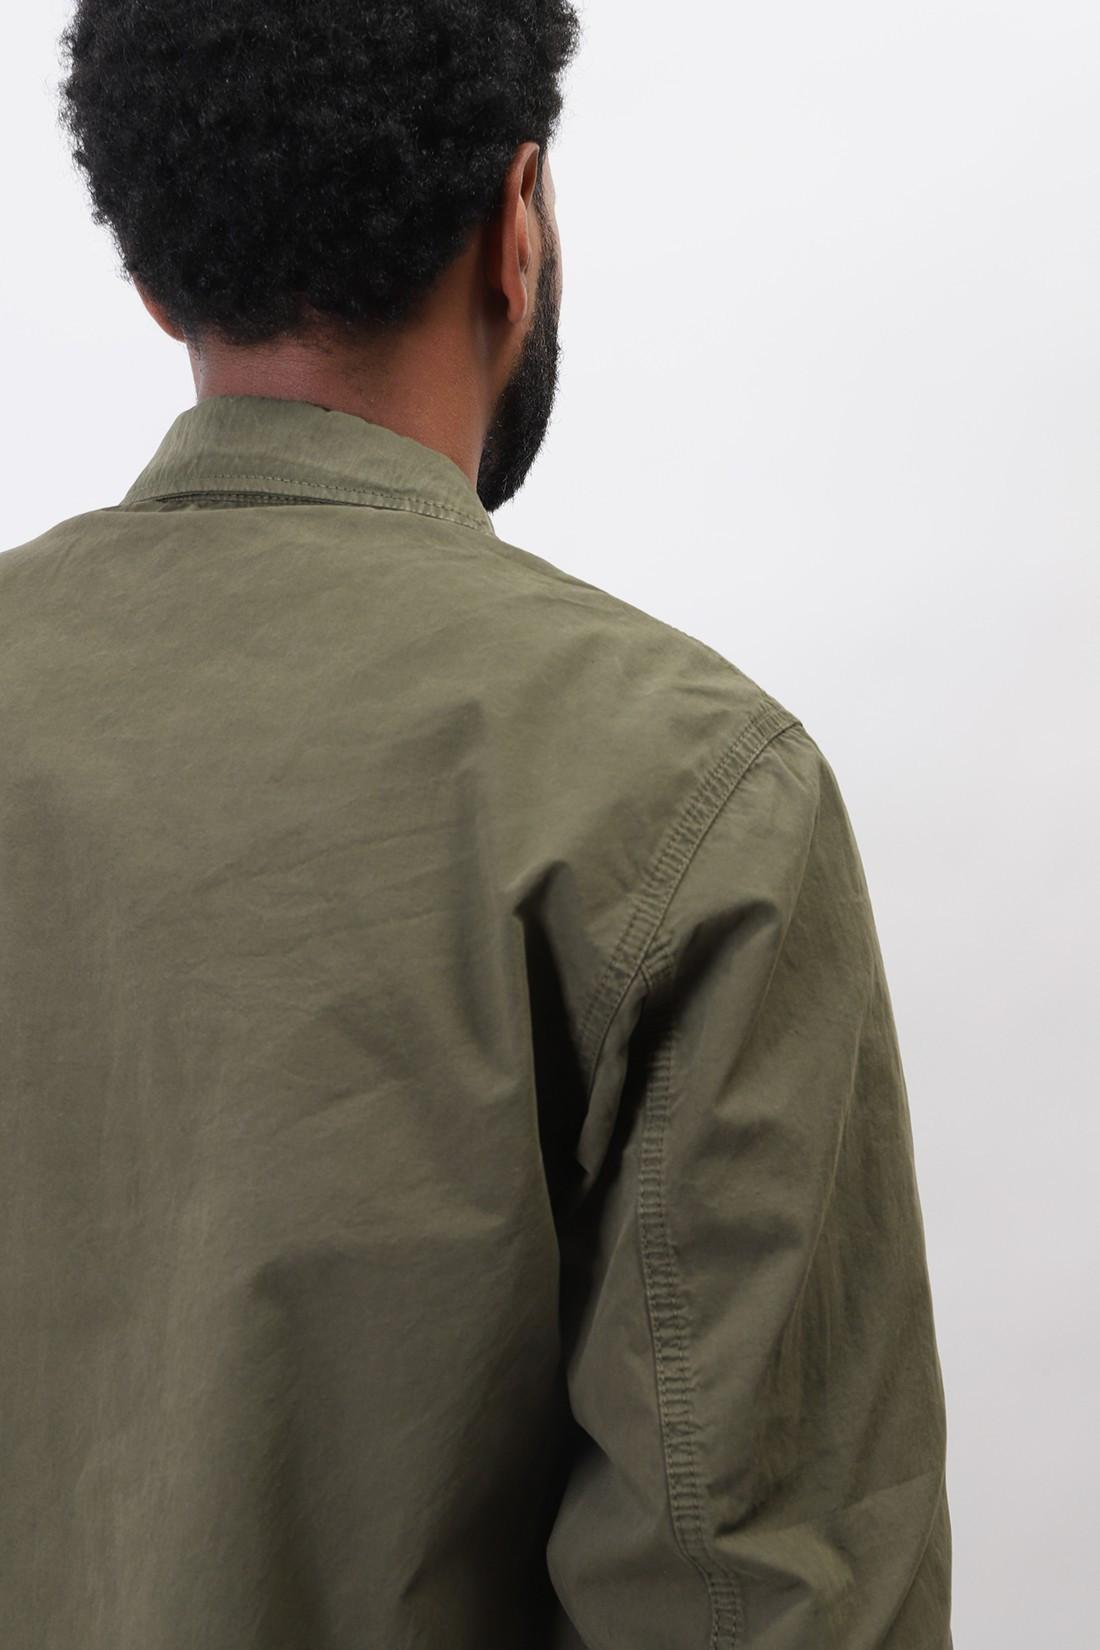 STONE ISLAND / 117wn overshirt v0158 Verde oliva